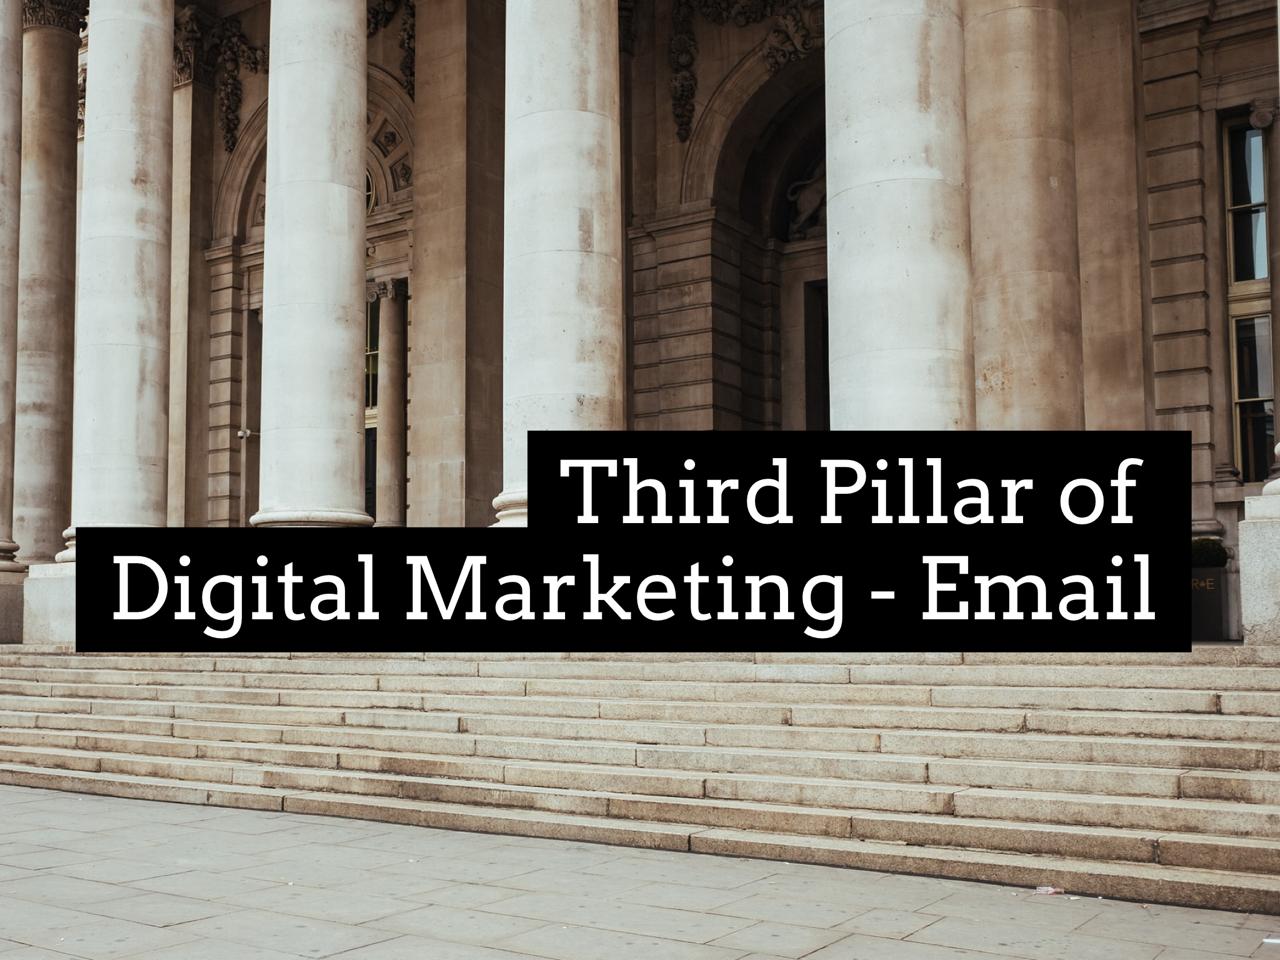 Third Pillar Digital Marketing - Email